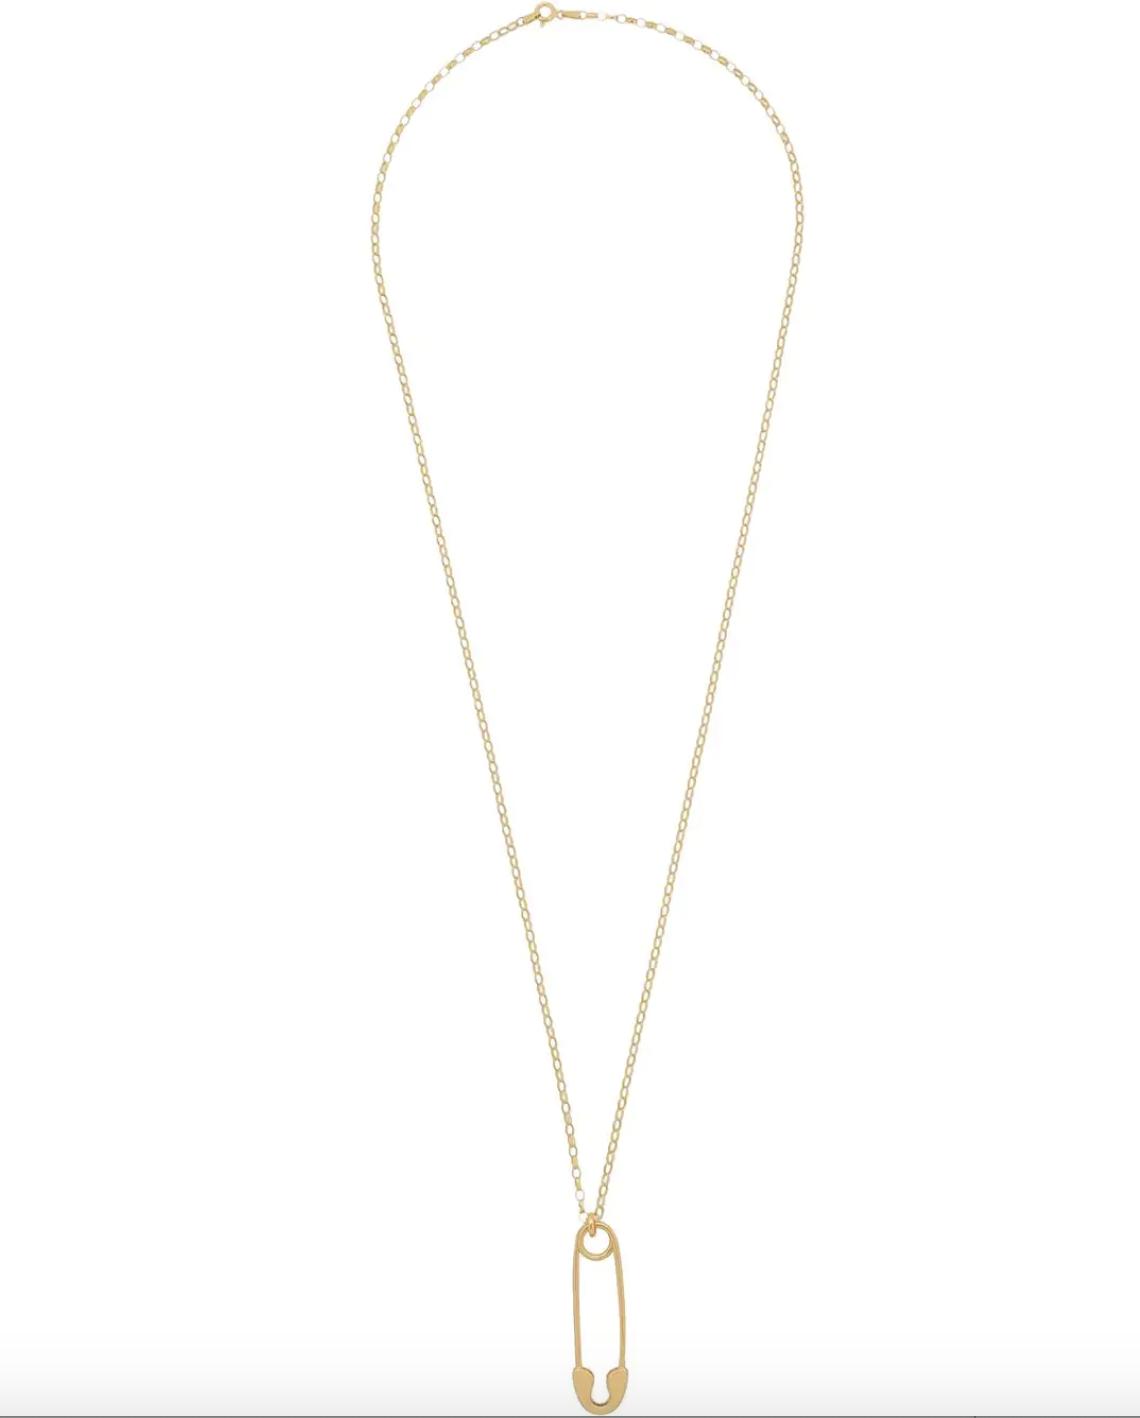 True Rocks safety pin necklace